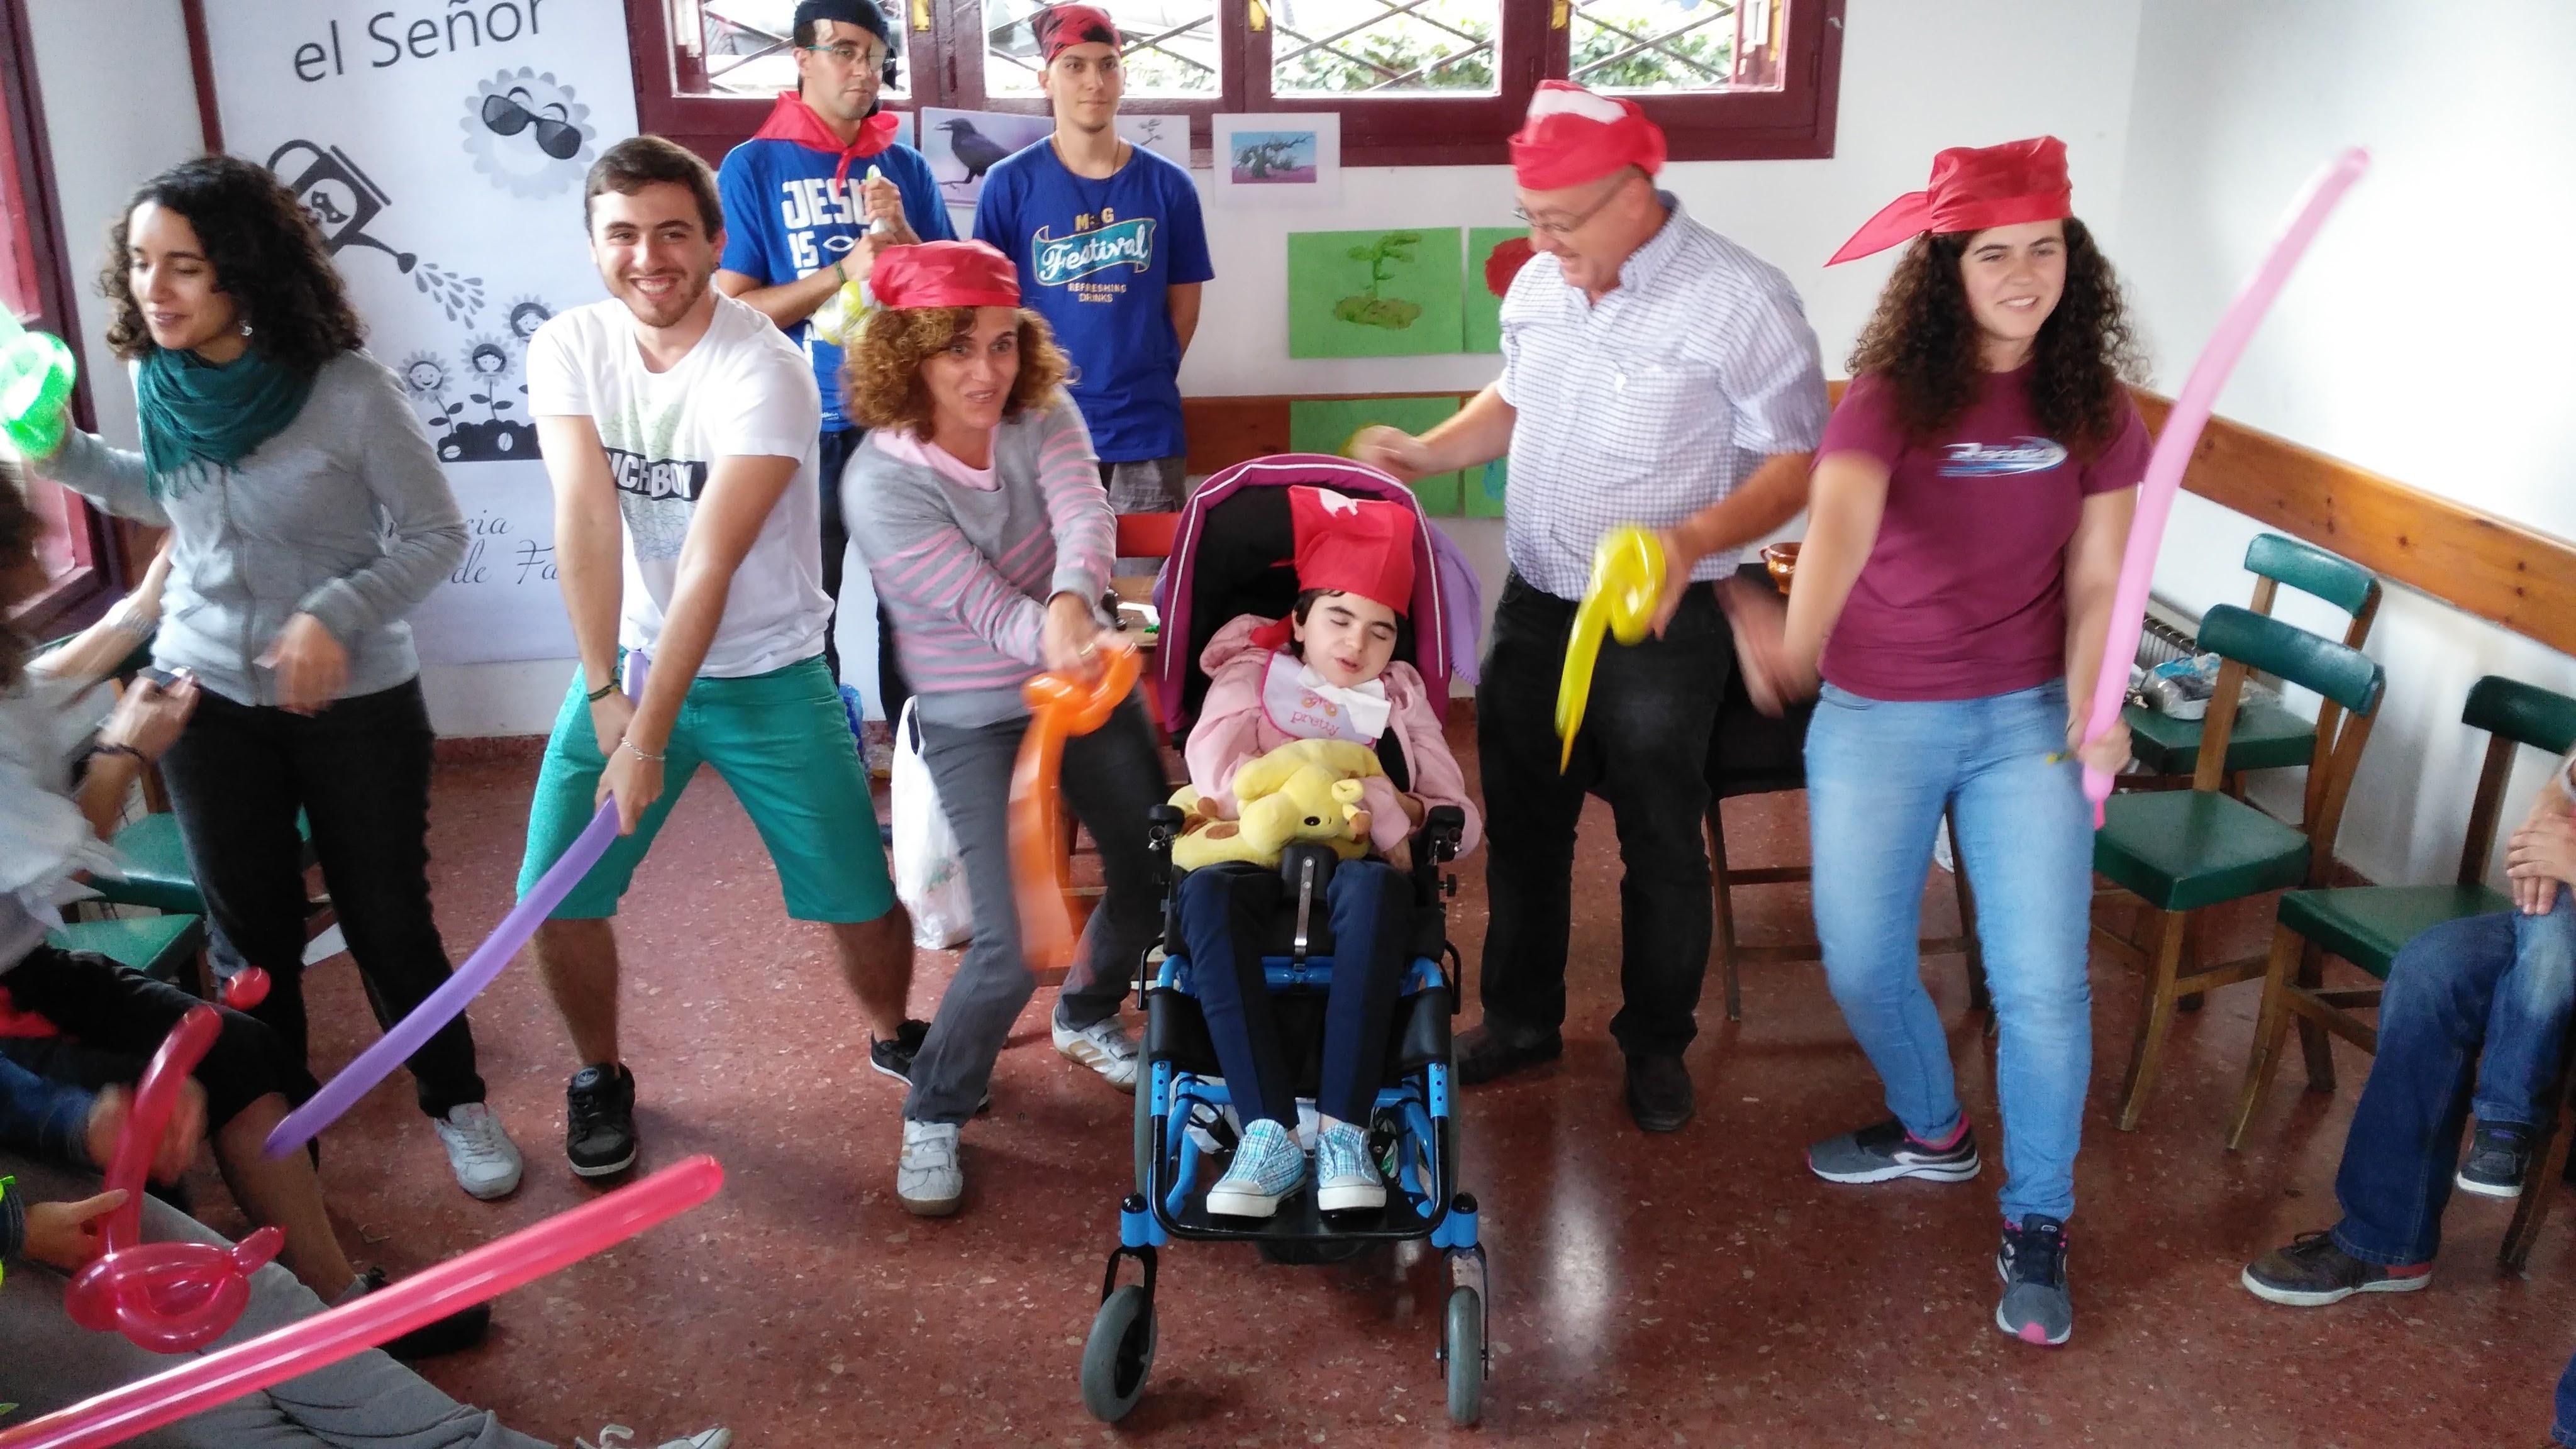 Picasa - 2015.09.12-13 - Convivencia Sector Familias(9).jpg